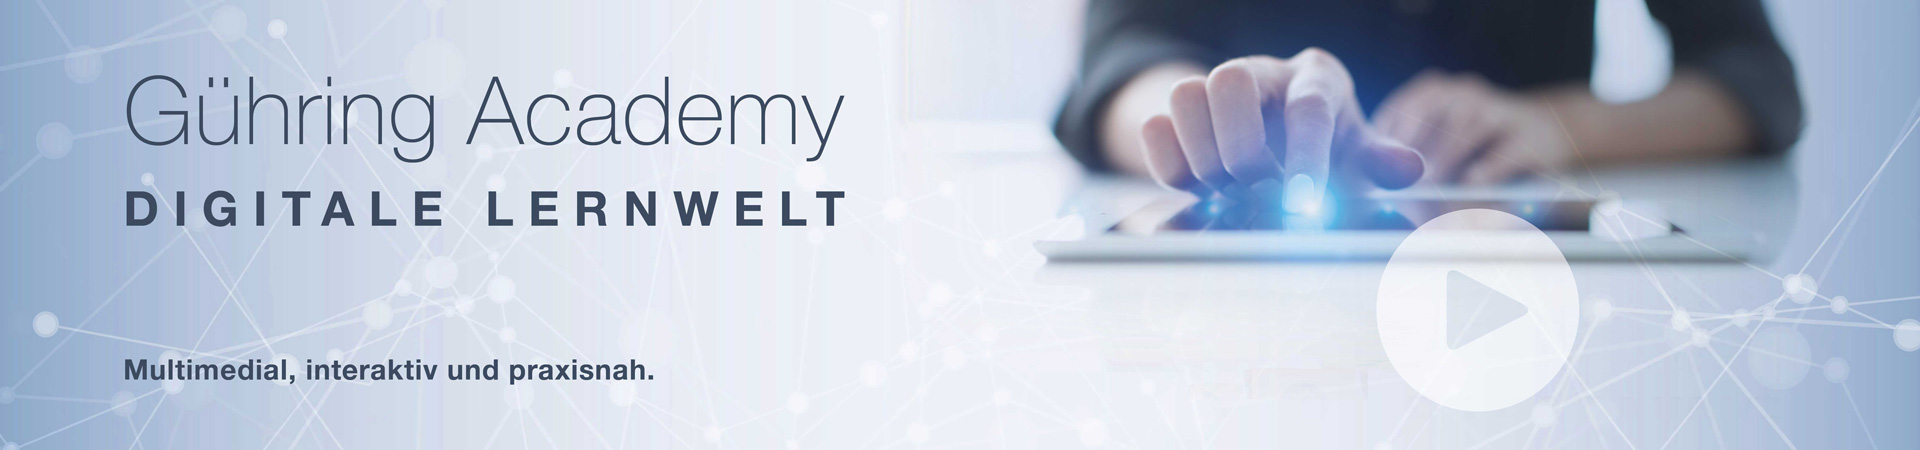 Gühring Academy - Digitale Lernwelt